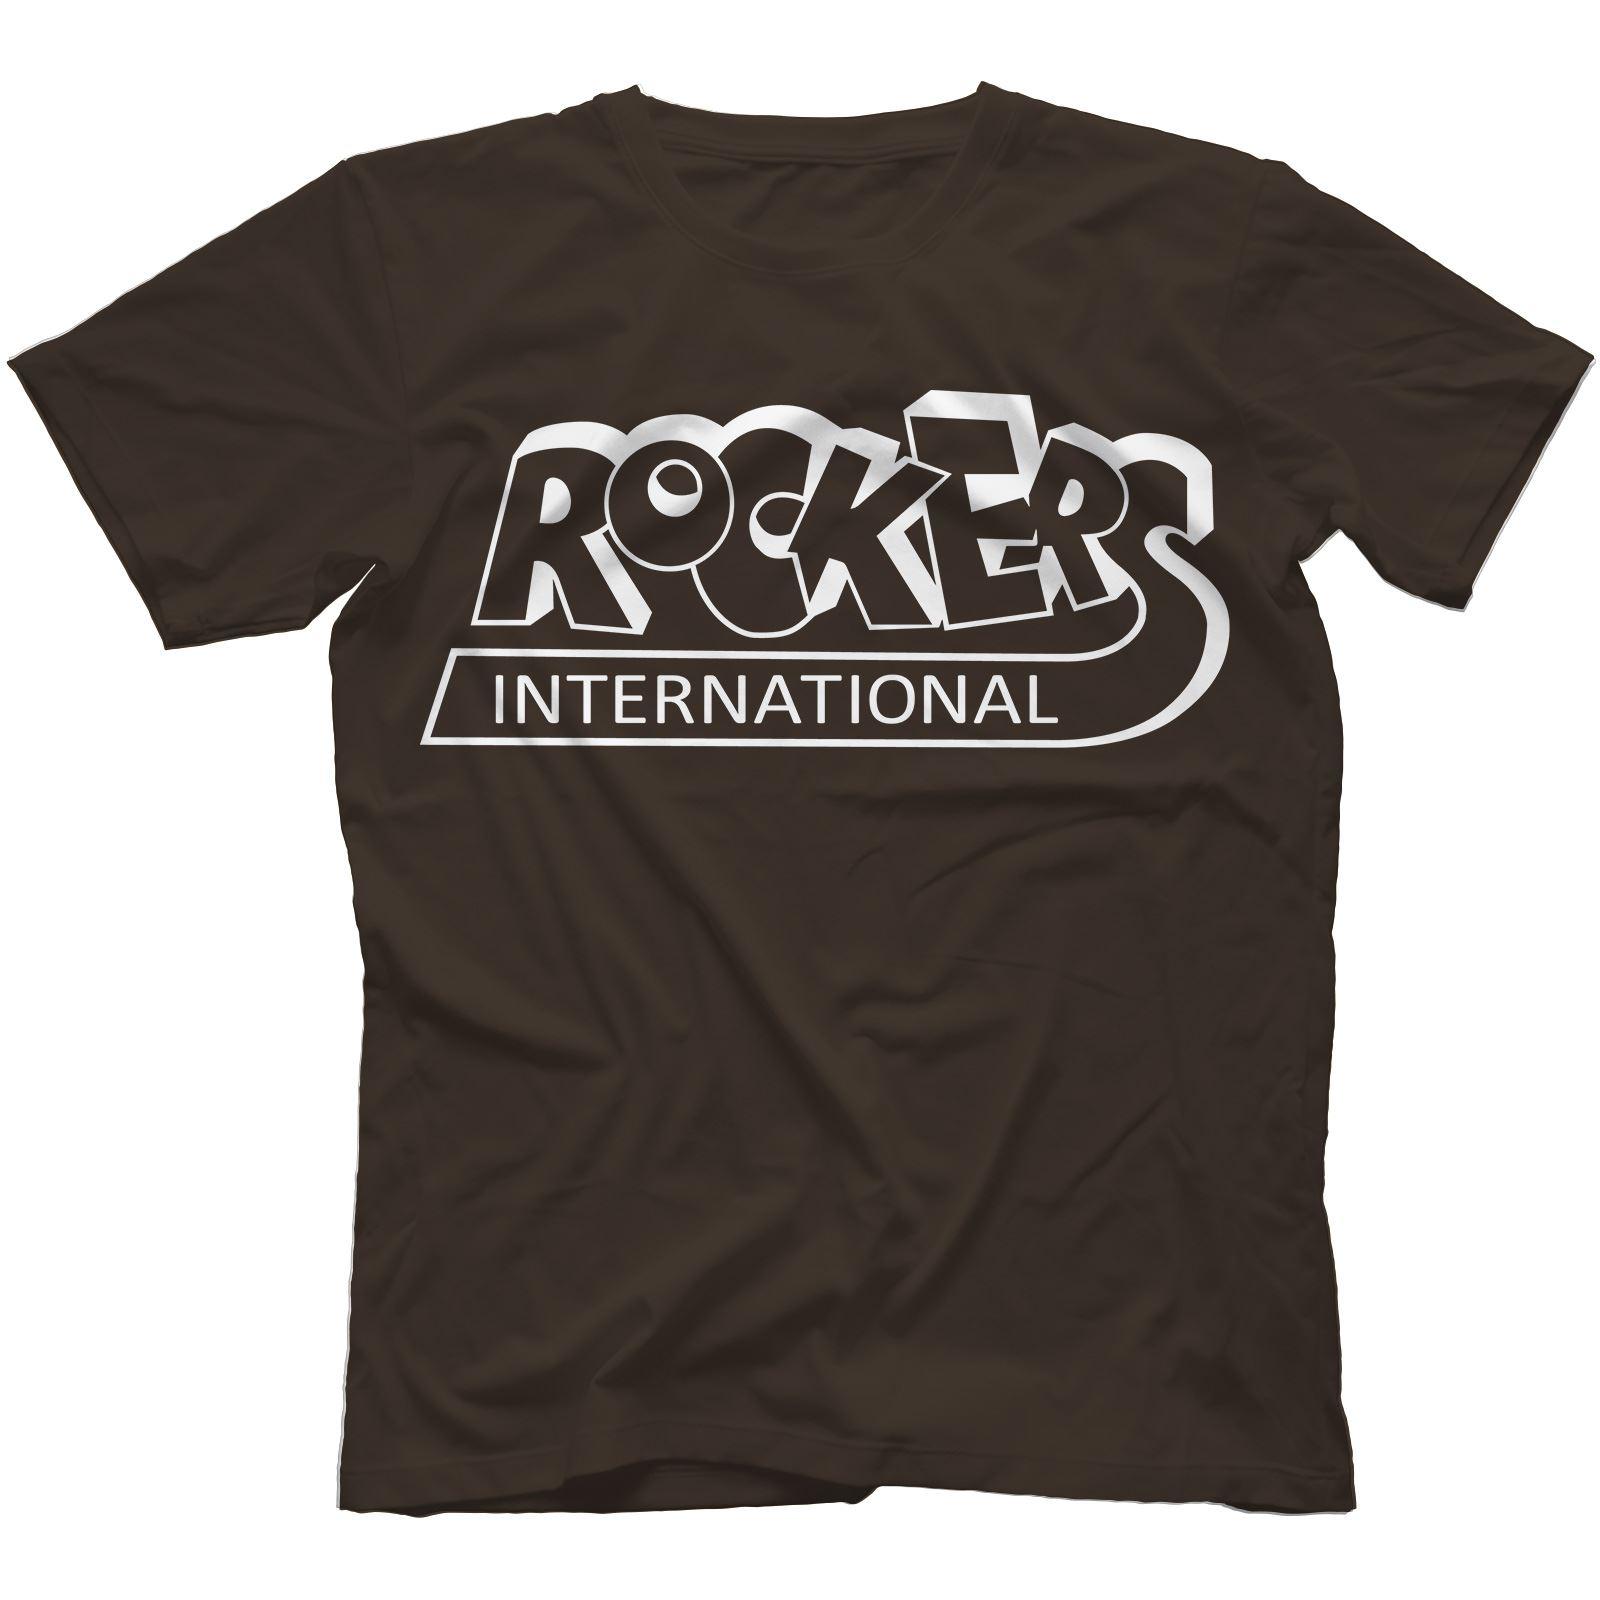 Rockers-International-T-Shirt-100-Cotton-King-Tubby-Dub-Augustus-Pablo